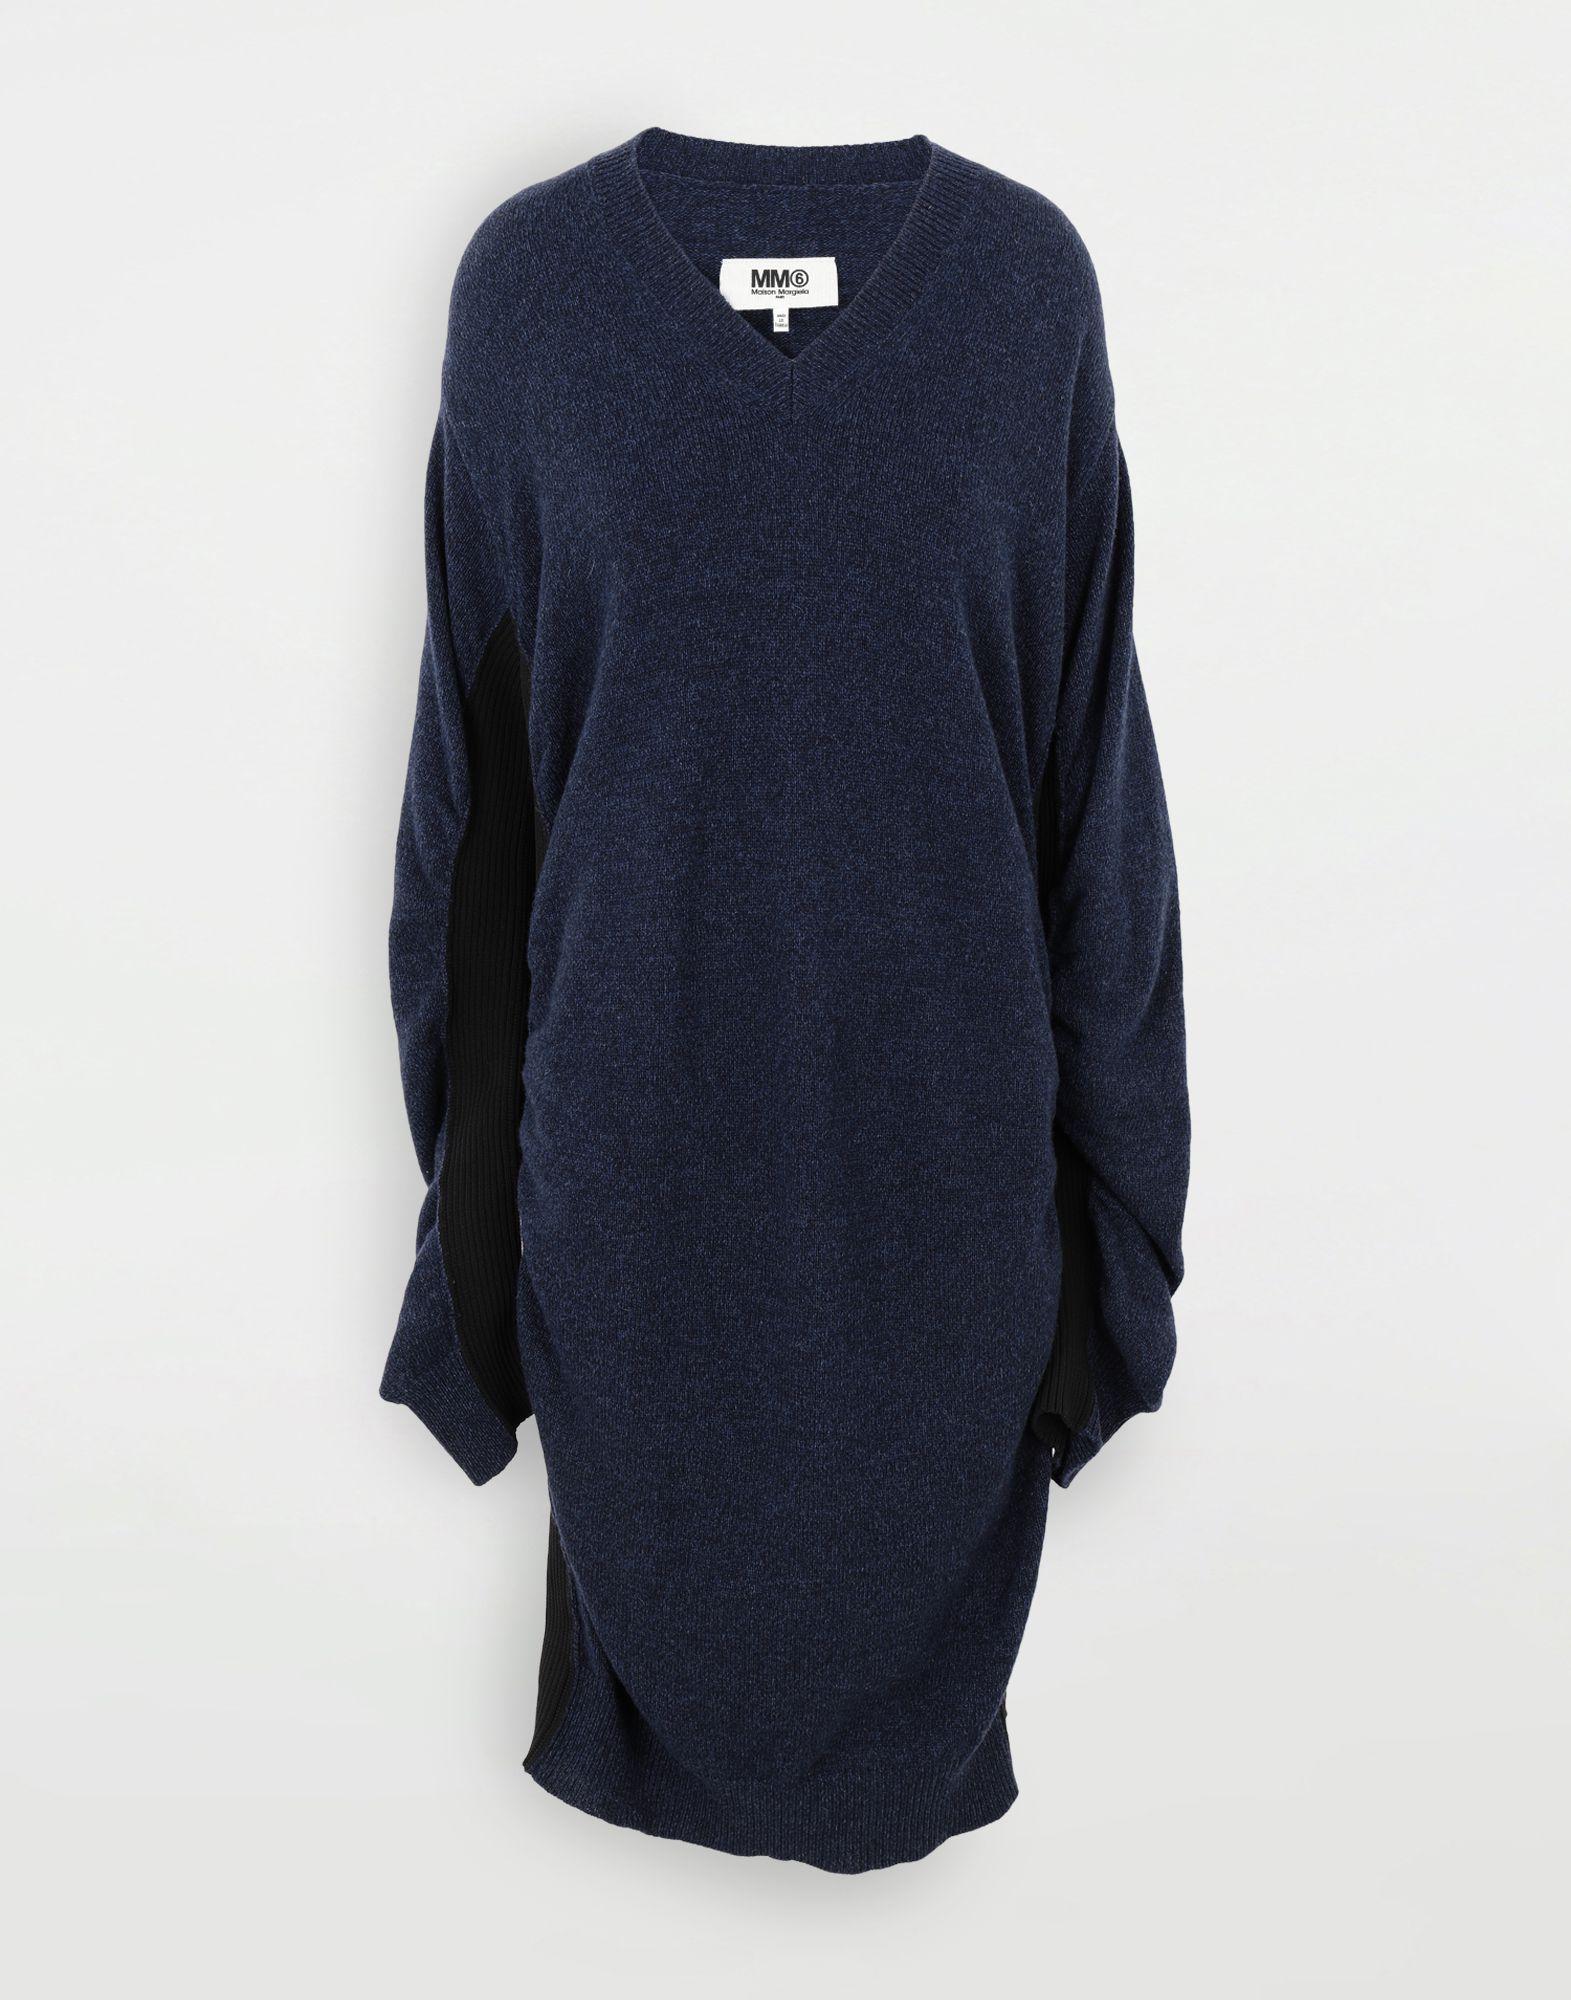 MM6 MAISON MARGIELA Ruched wool dress Short dress Woman f